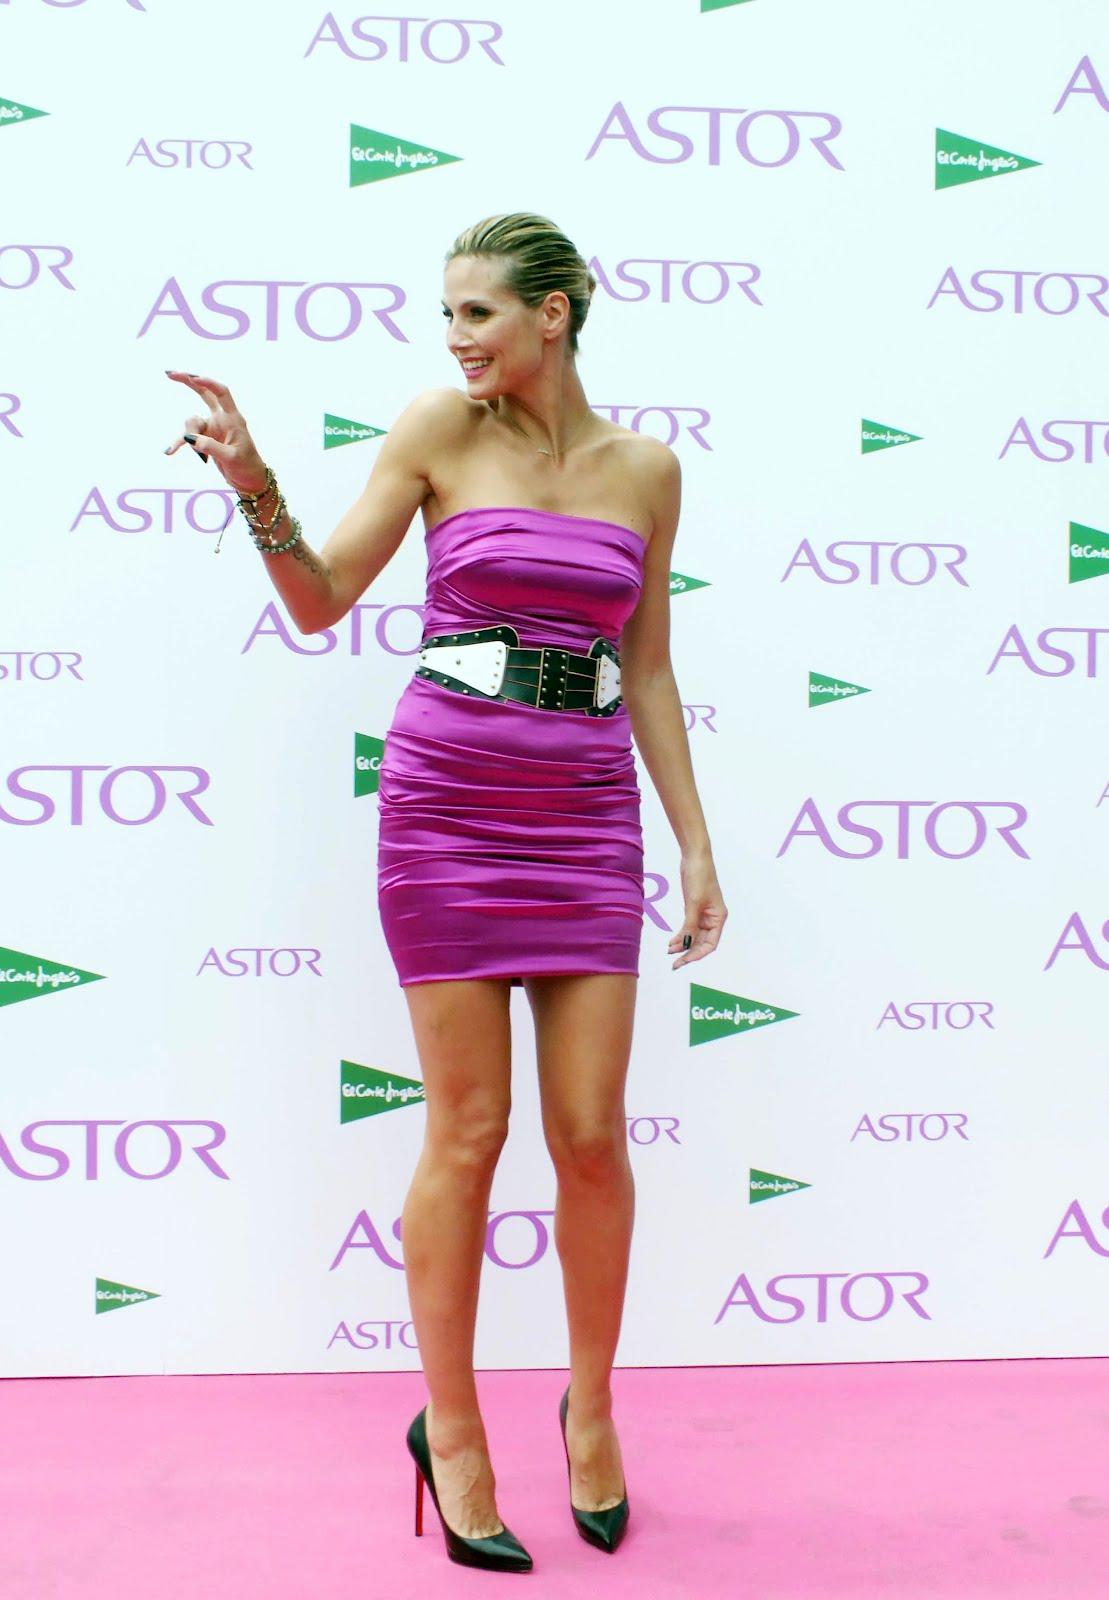 http://2.bp.blogspot.com/-STo-_fdabN8/T_3Hf_GTCPI/AAAAAAAATU8/wvJSMUS17fA/s1600/Heidi_Klum_20120608_Astor_Madrid_012.jpg